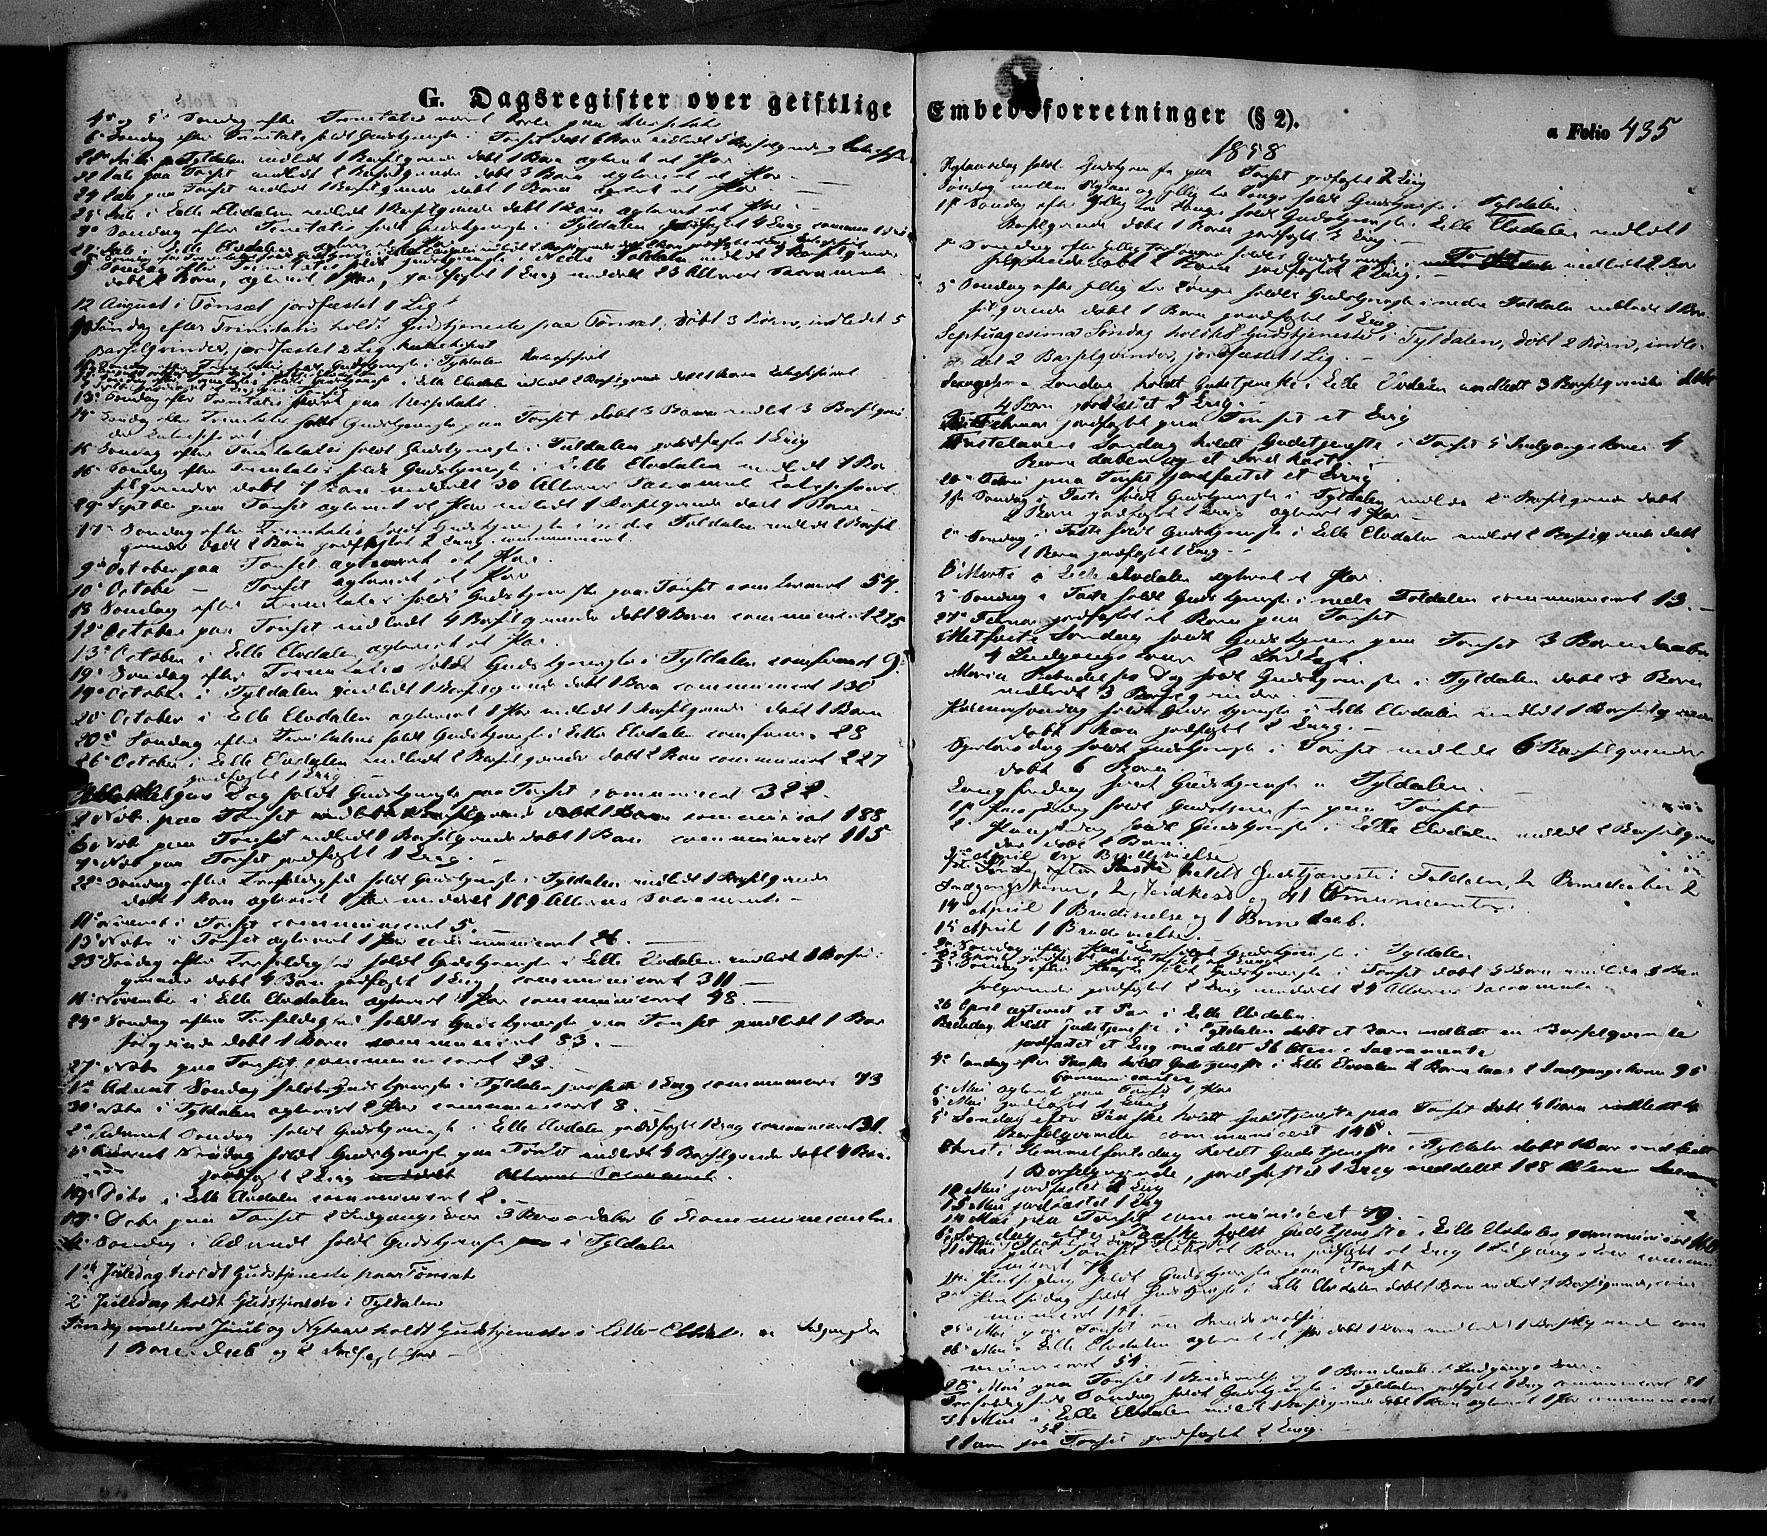 SAH, Tynset prestekontor, Ministerialbok nr. 20, 1848-1862, s. 435